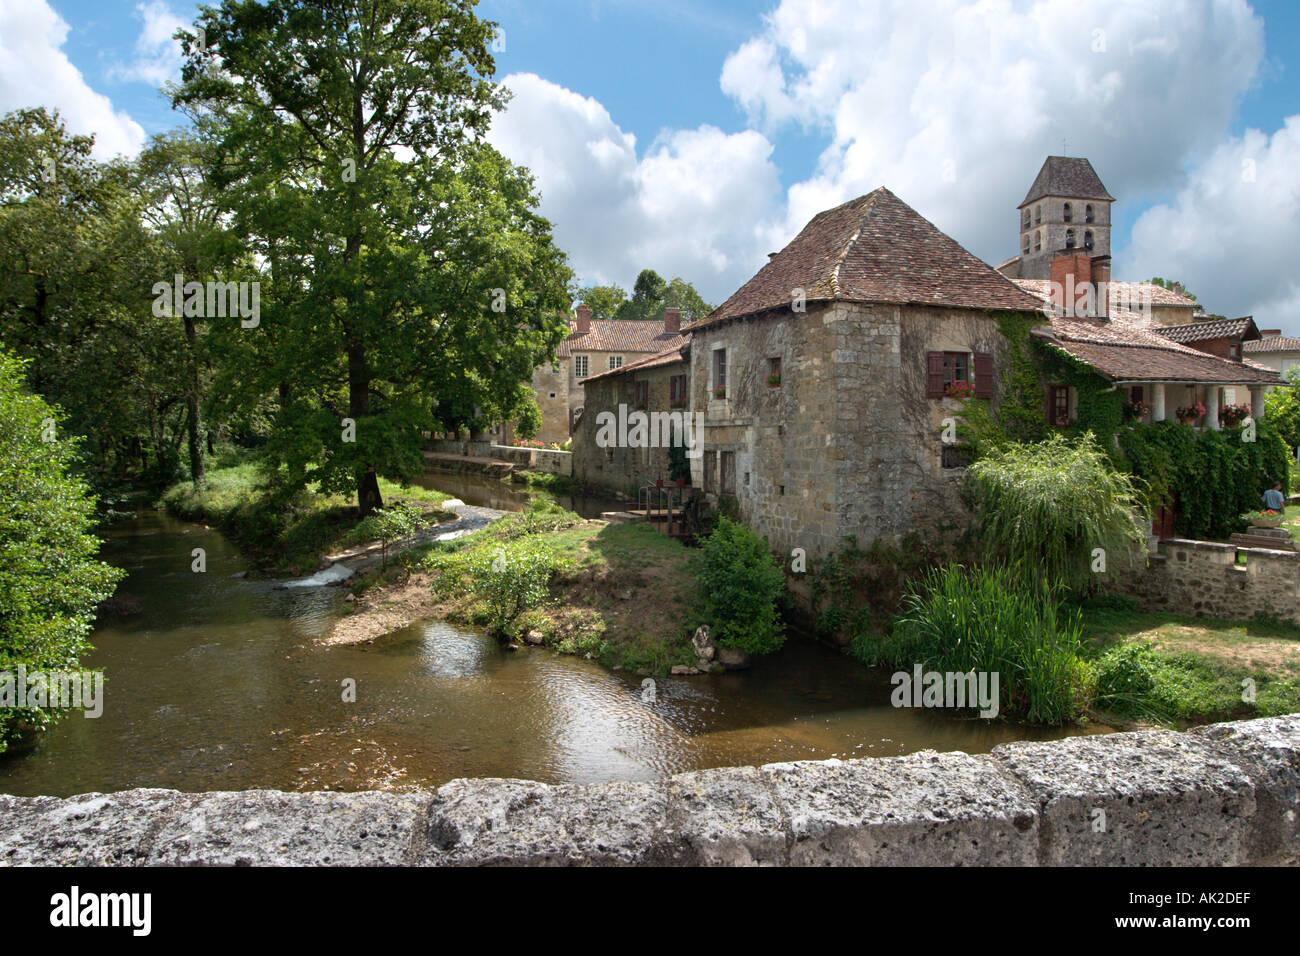 River and Church of St Jean Baptiste, St Jean de Cole, Dordogne, France - Stock Image